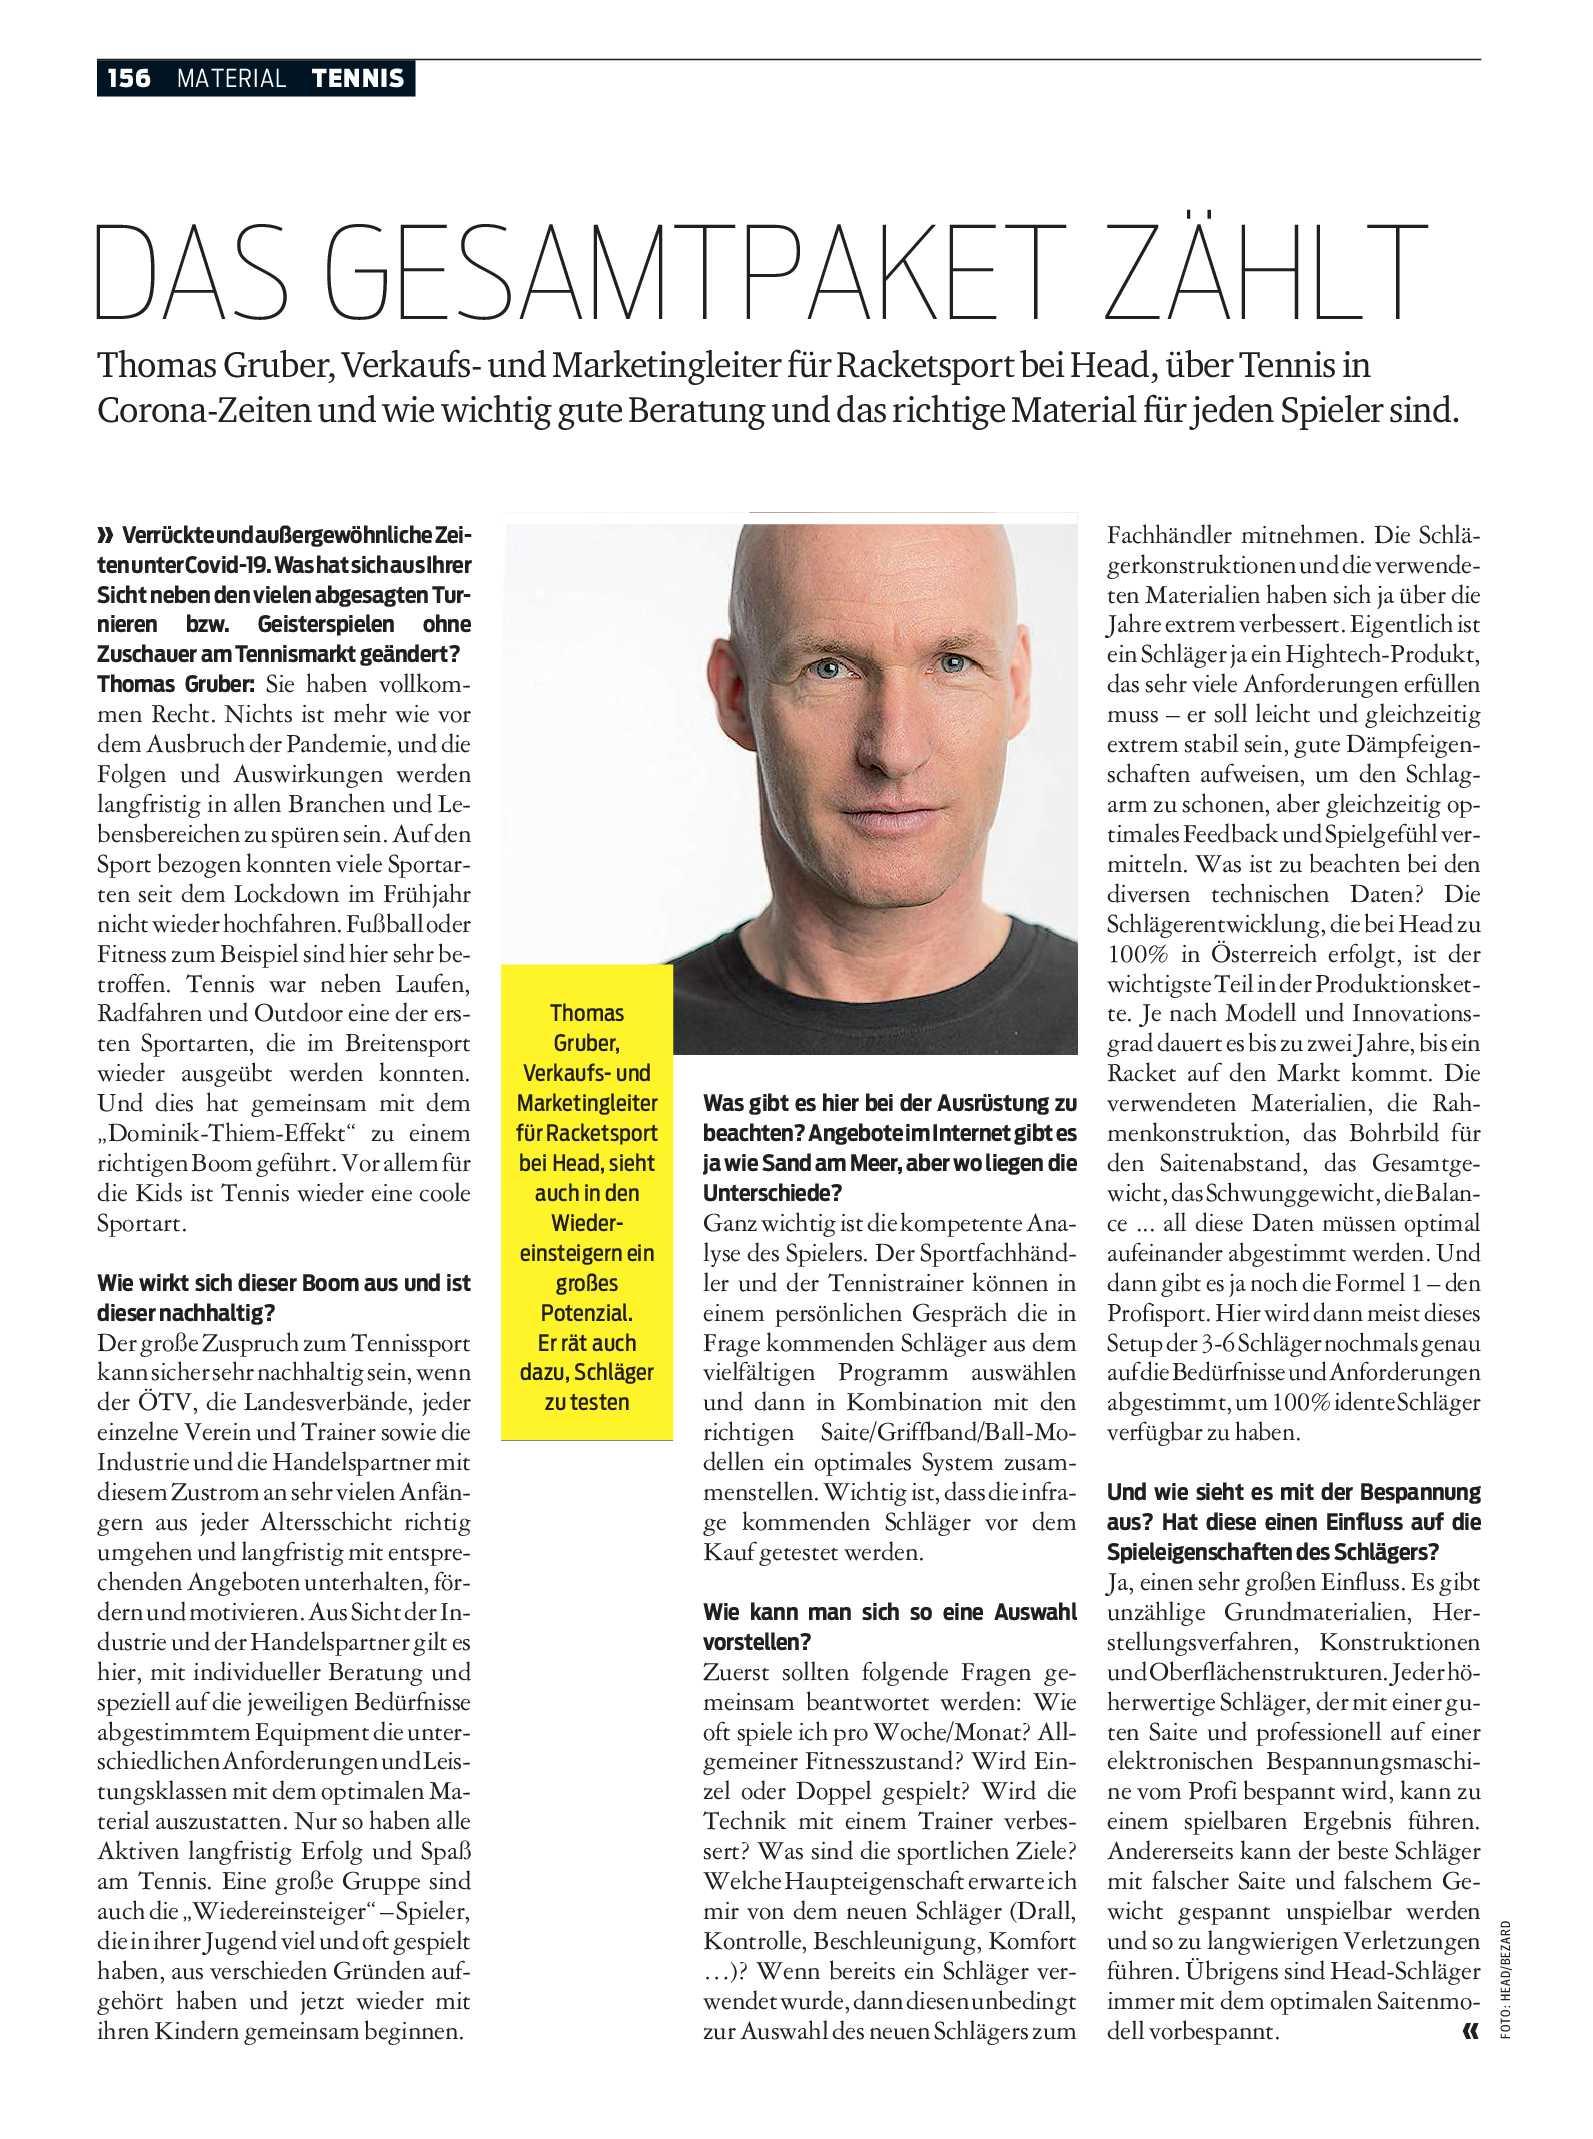 public/epaper/imported/20201209/kurier/magazin/magazin_20201209_156.jpg